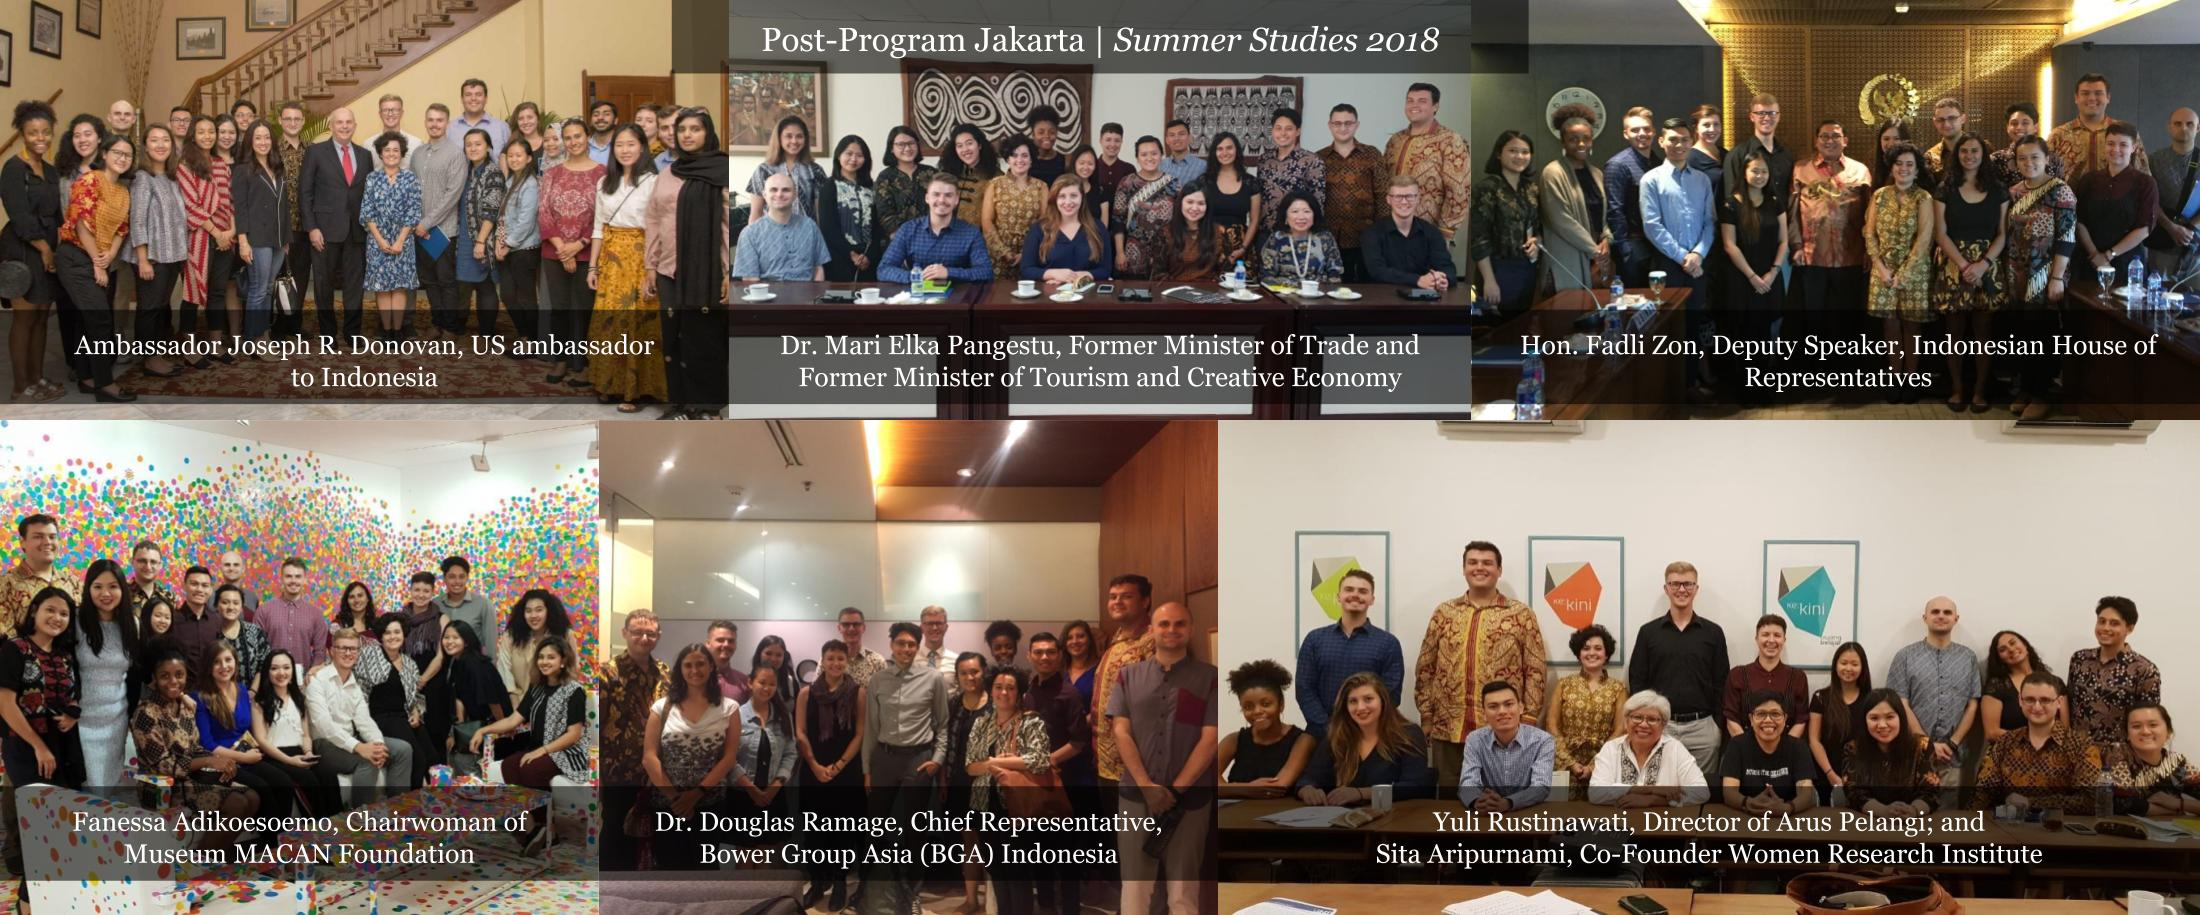 USINDO Summer Studies 2018 Post Program